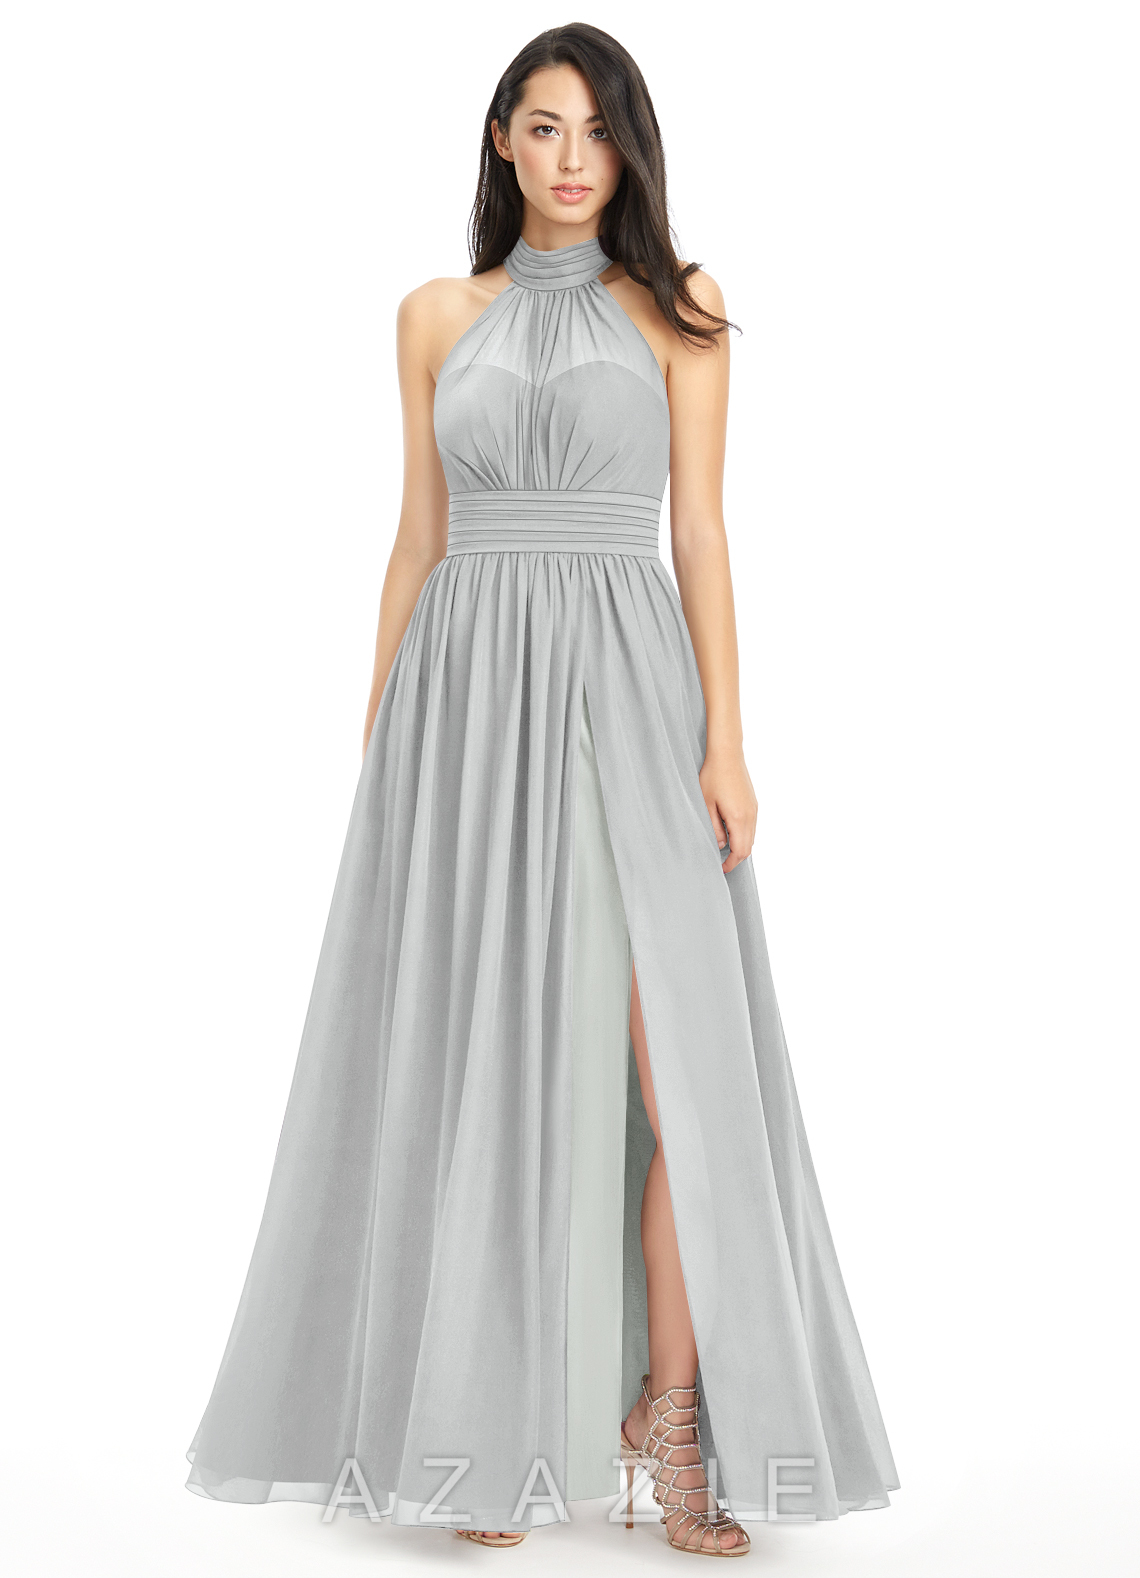 Silver bridesmaid dress good dresses for Metallic bridesmaid dresses wedding